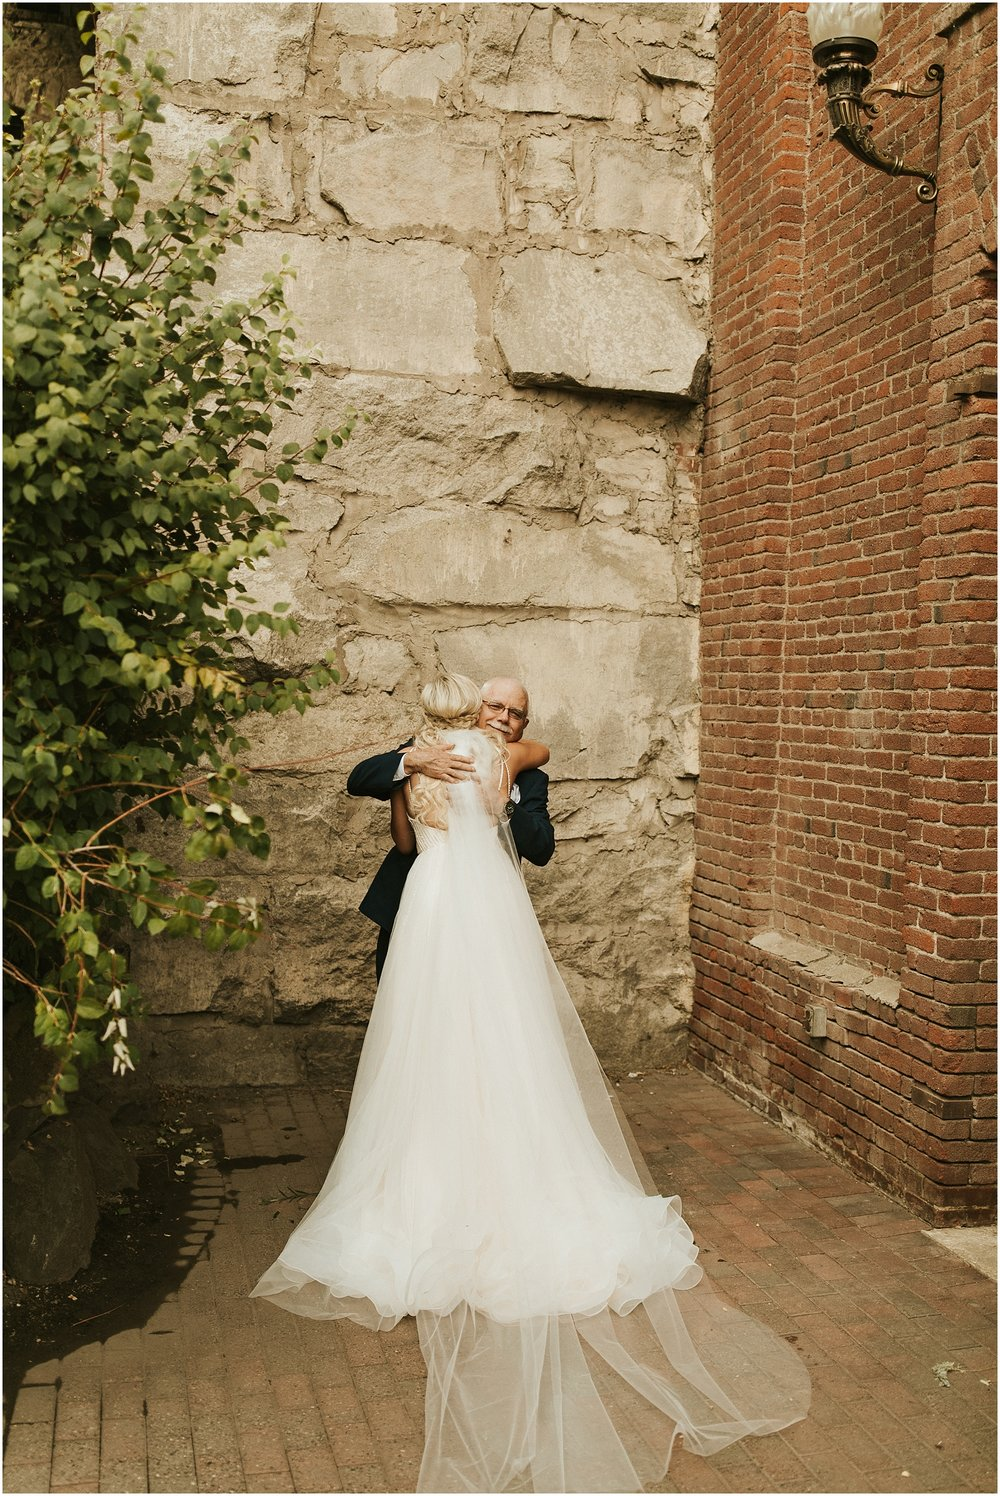 Chateau Rive Spokane Wedding Cassie Trottier Photography1005.jpg